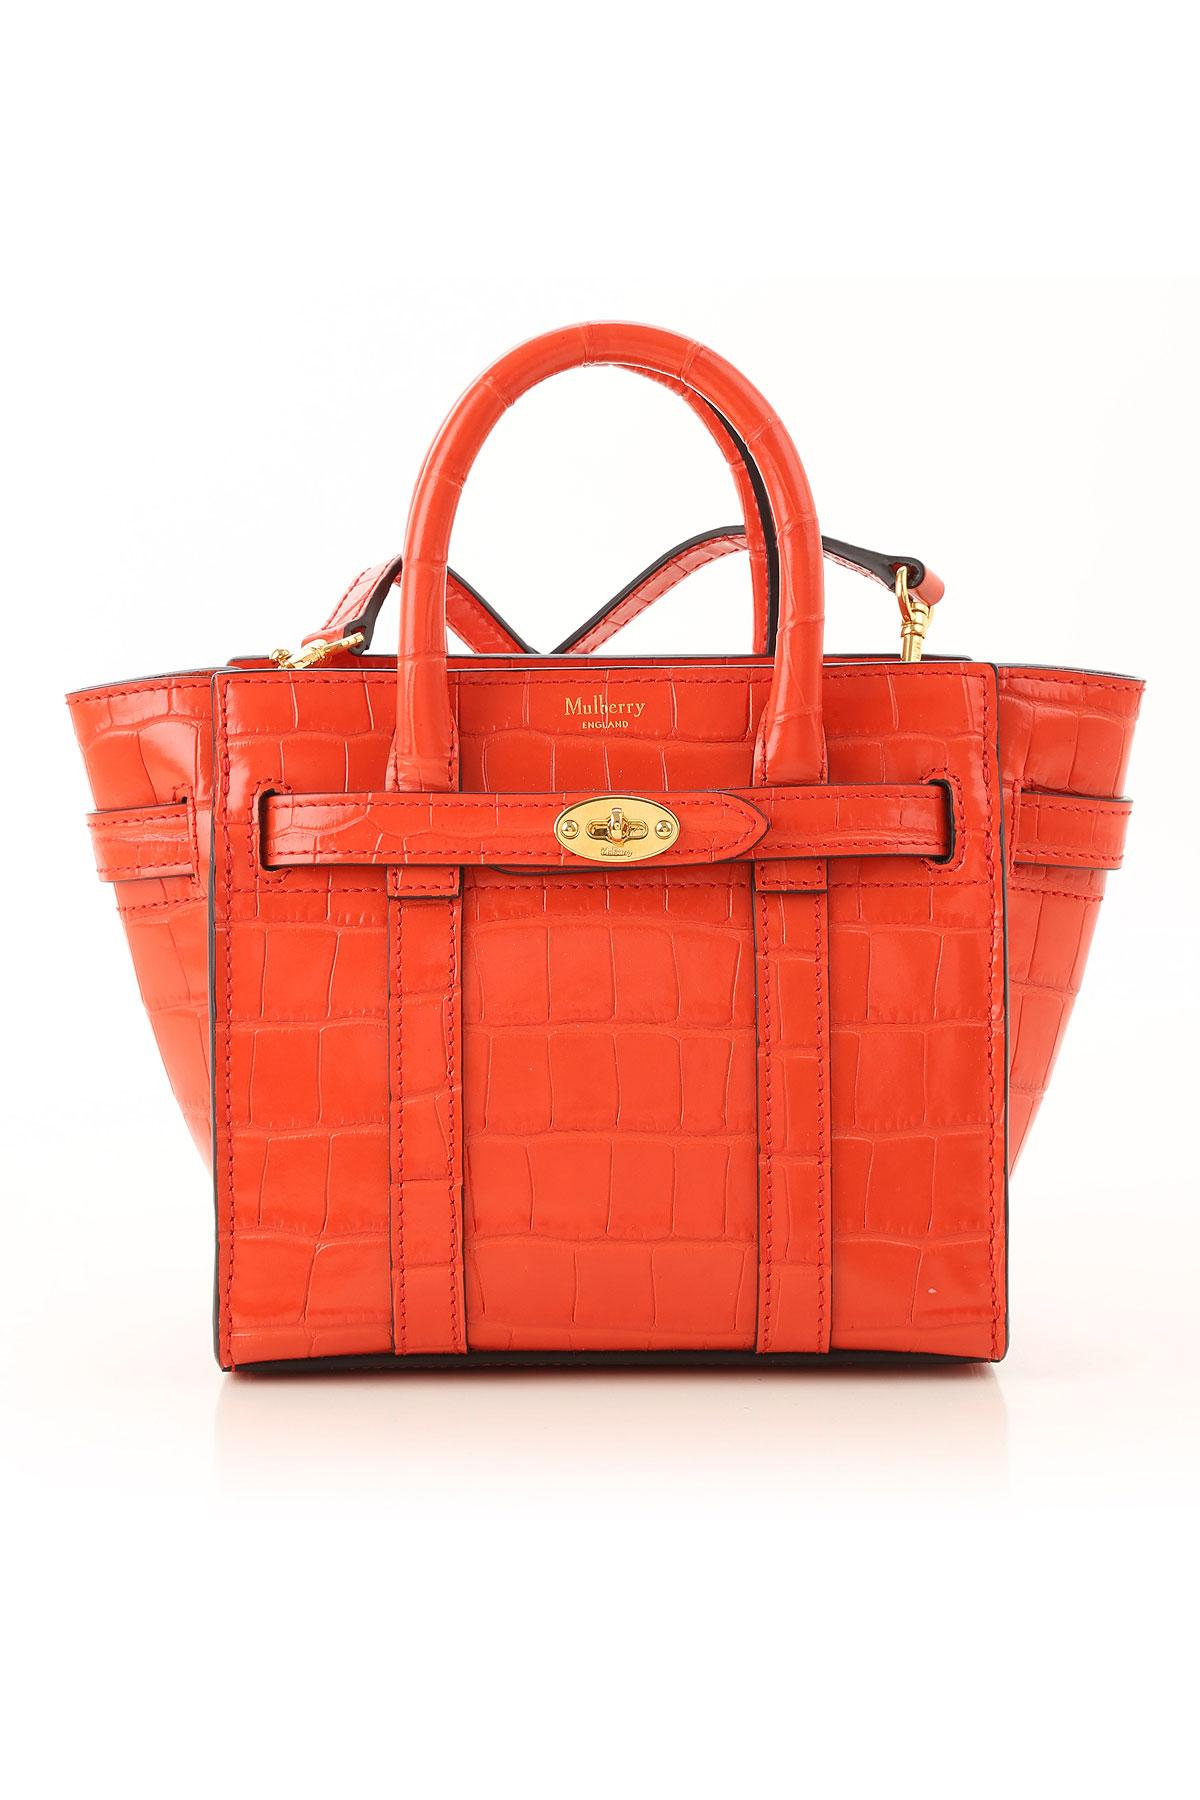 51dd7721e1fa Mulberry Handbags in Red - Lyst